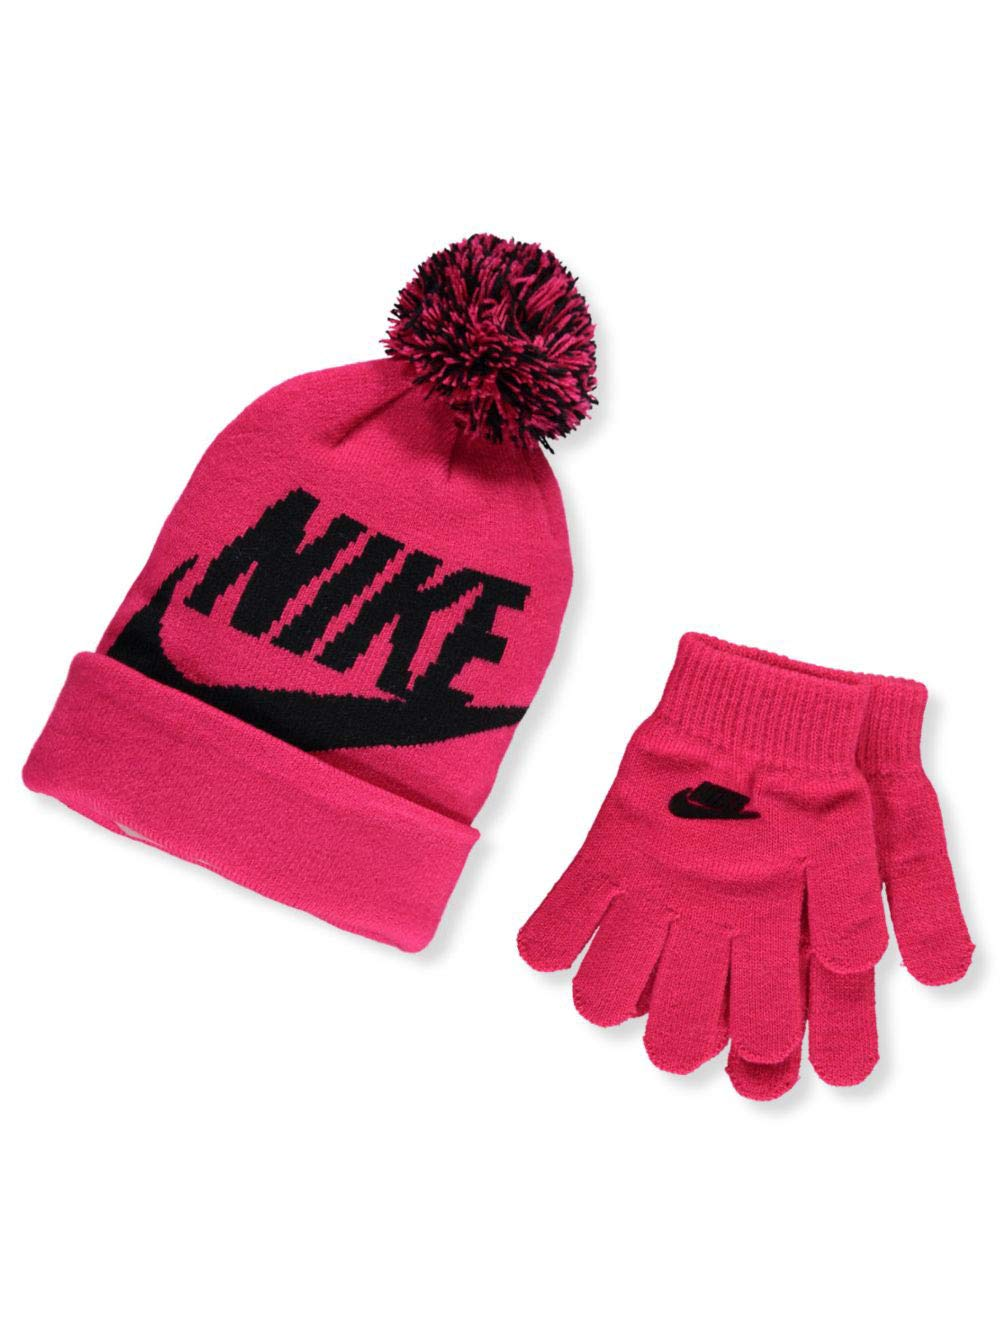 Kids' Nike Swoosh Pom Beanie Hat and Gloves Set